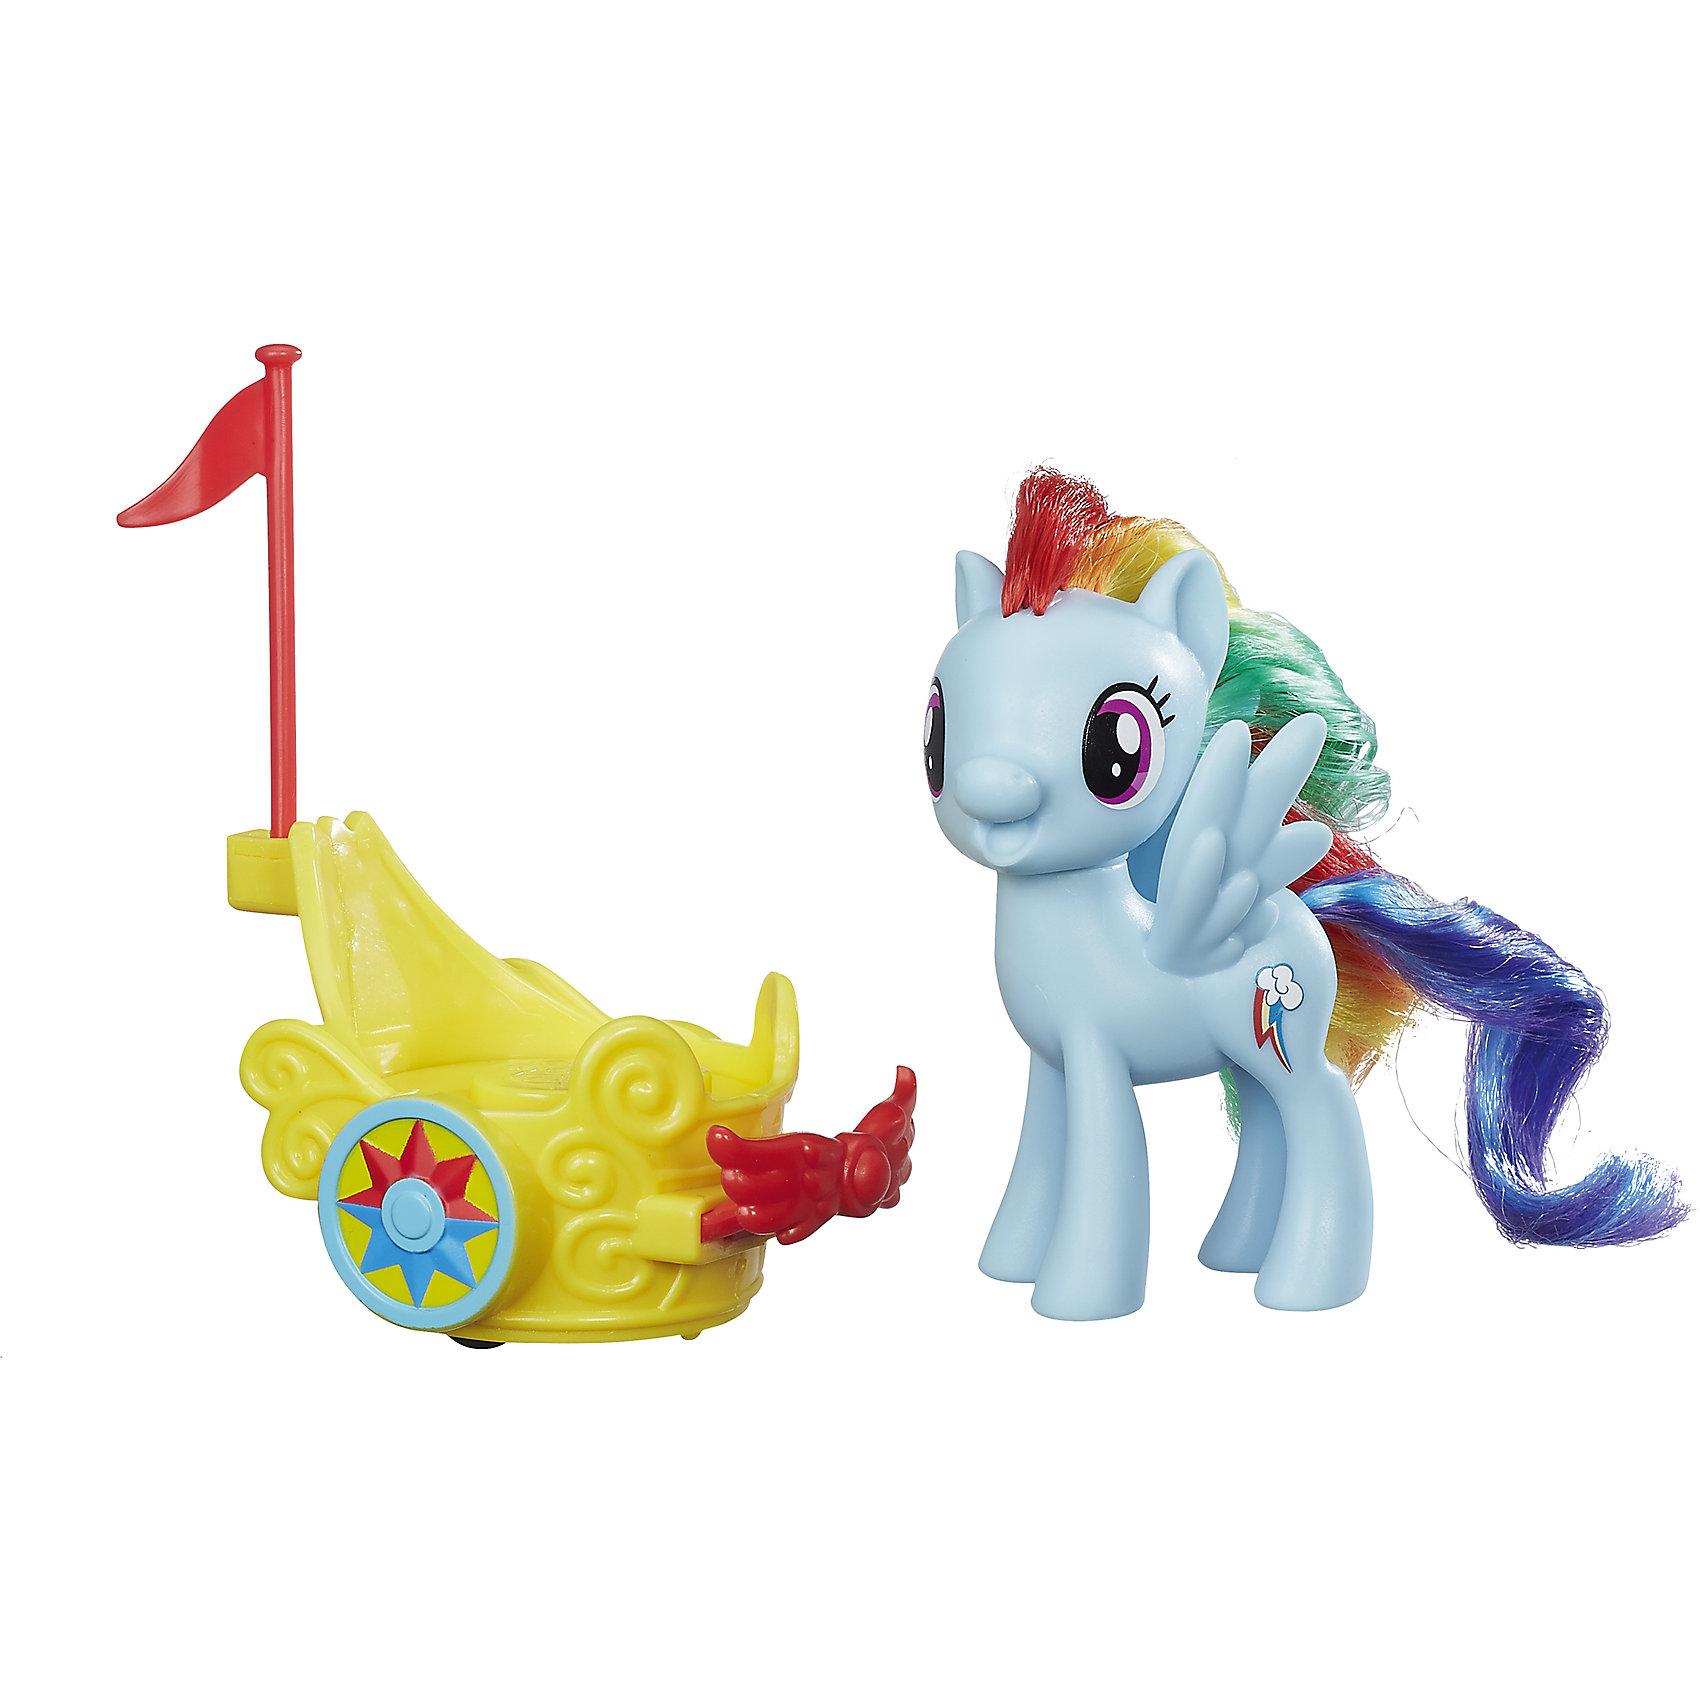 Пони в карете, My little Pony, Hasbro, B9159/B9835Любимые герои<br><br><br>Ширина мм: 270<br>Глубина мм: 213<br>Высота мм: 181<br>Вес г: 280<br>Возраст от месяцев: 36<br>Возраст до месяцев: 2147483647<br>Пол: Женский<br>Возраст: Детский<br>SKU: 6674413